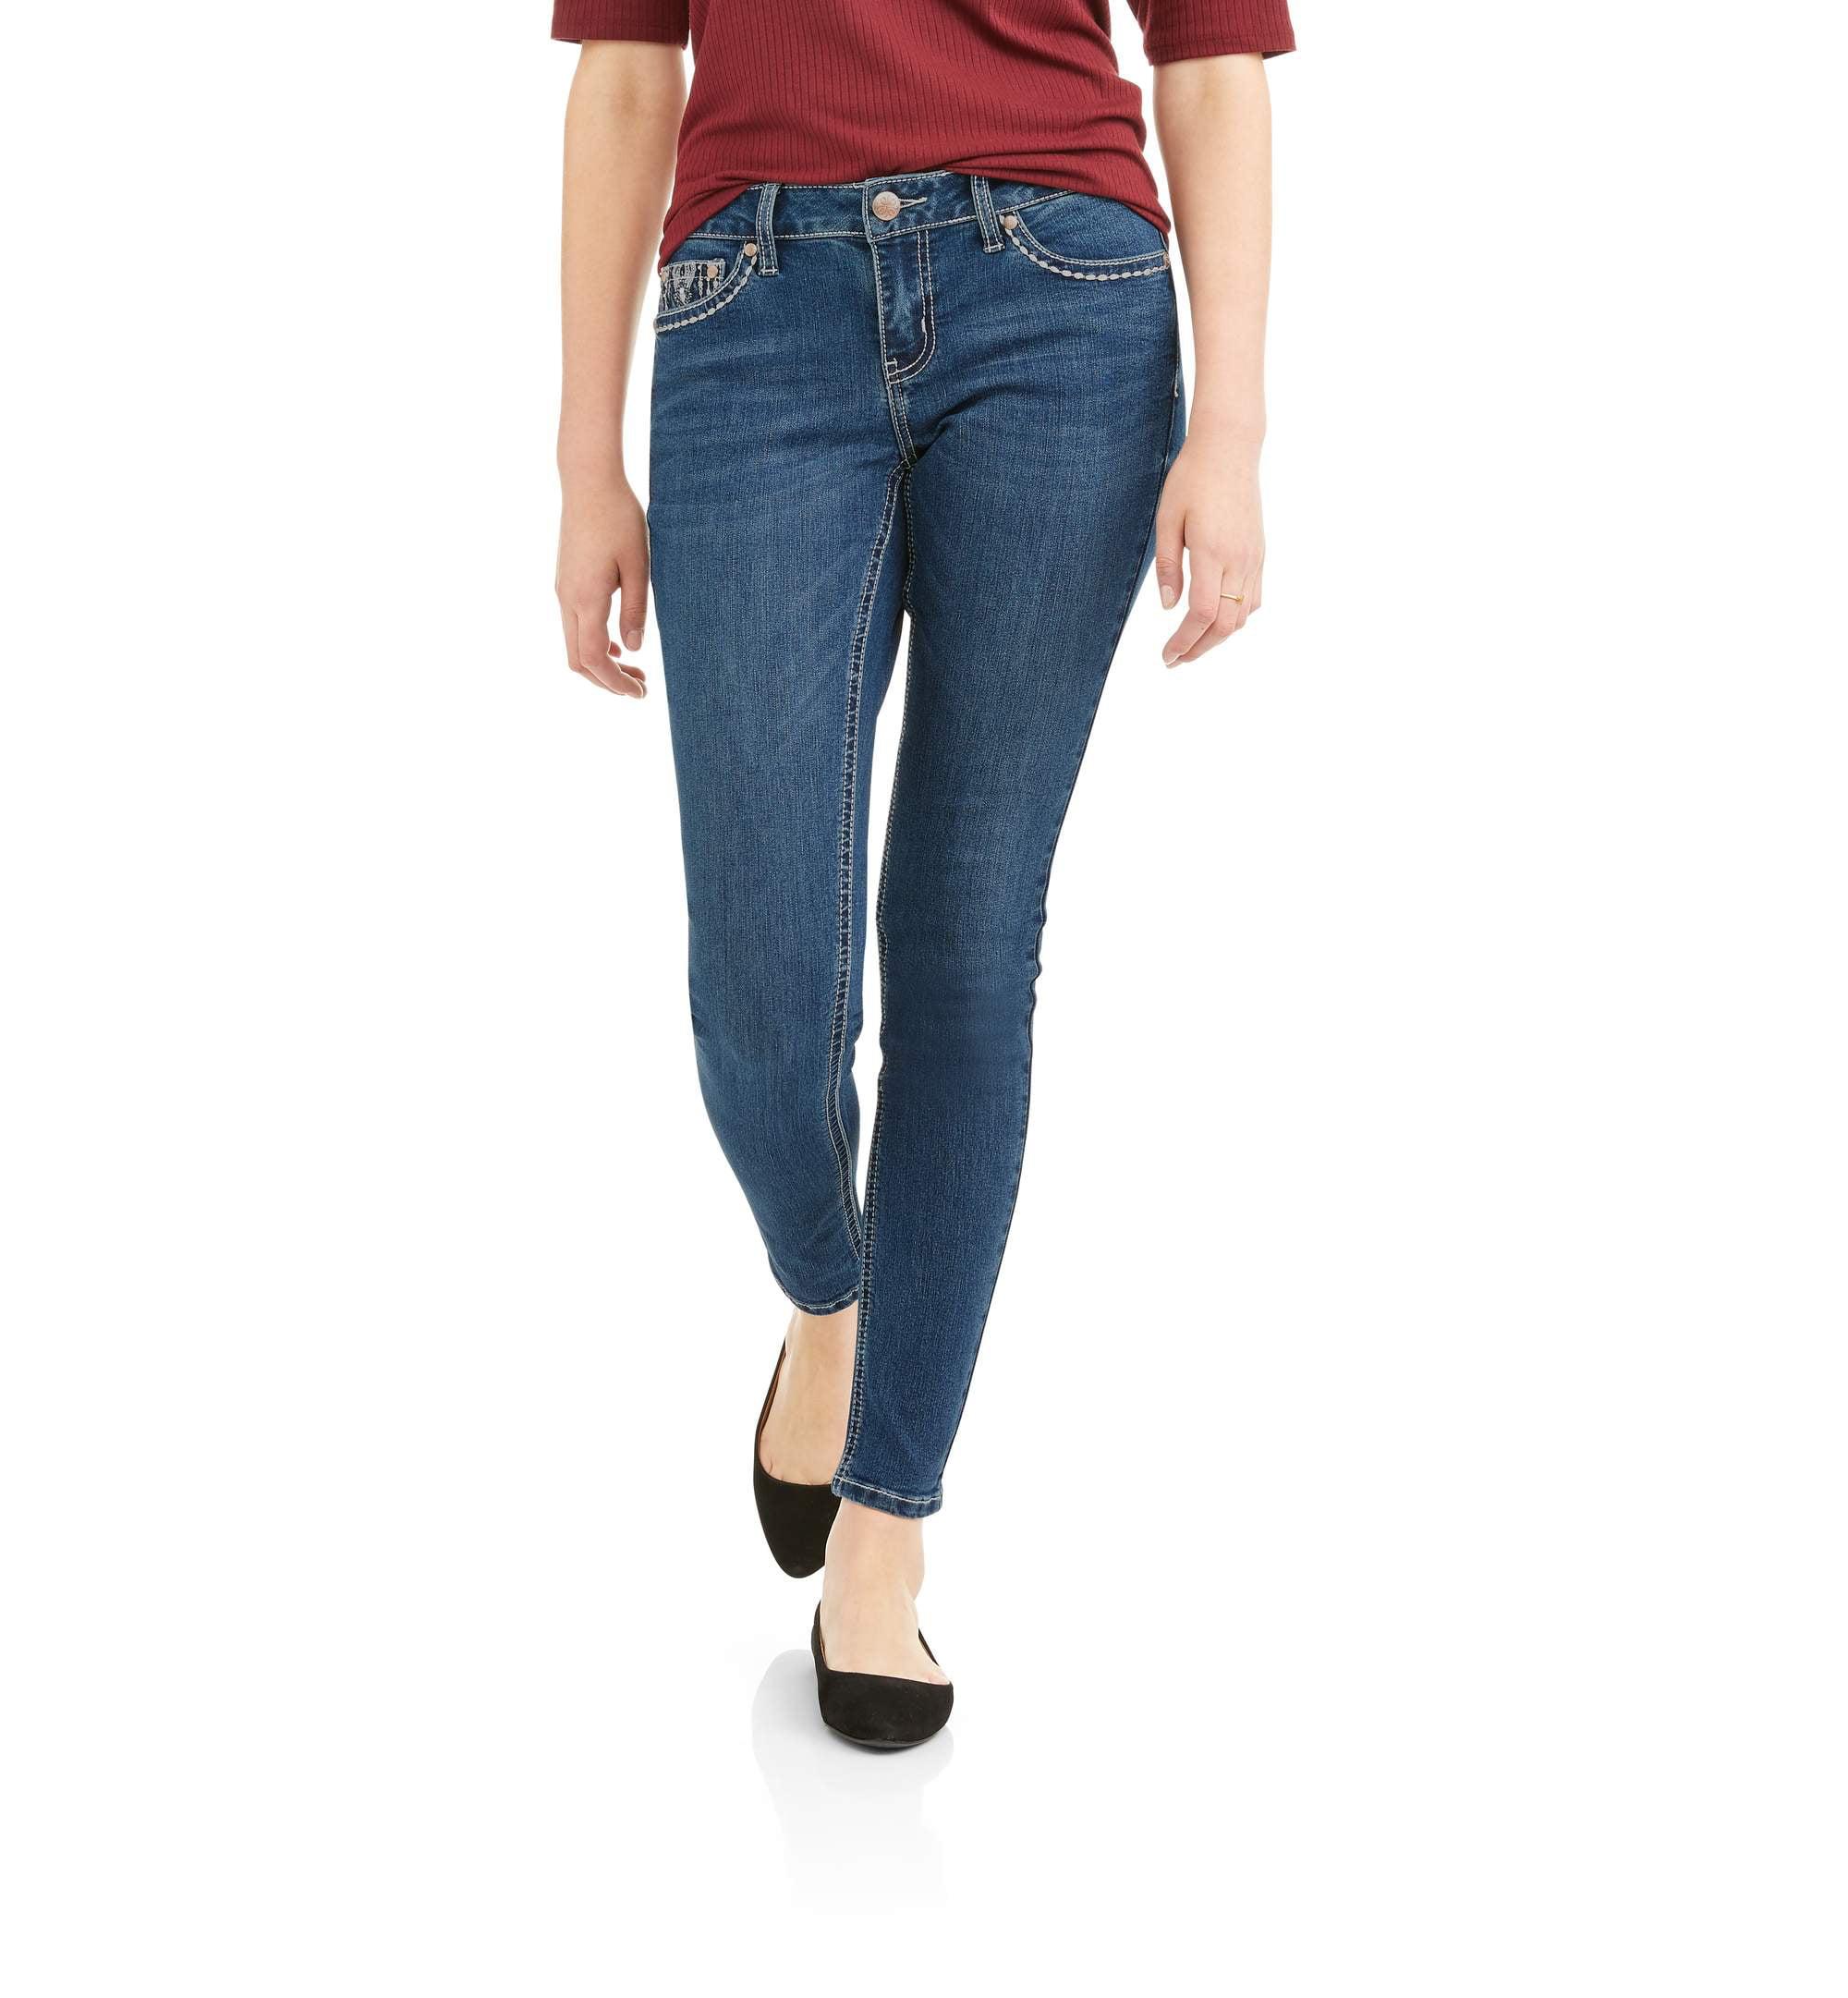 Zanadi Women's Skinny Jeans with Back Pocket Bling Detail